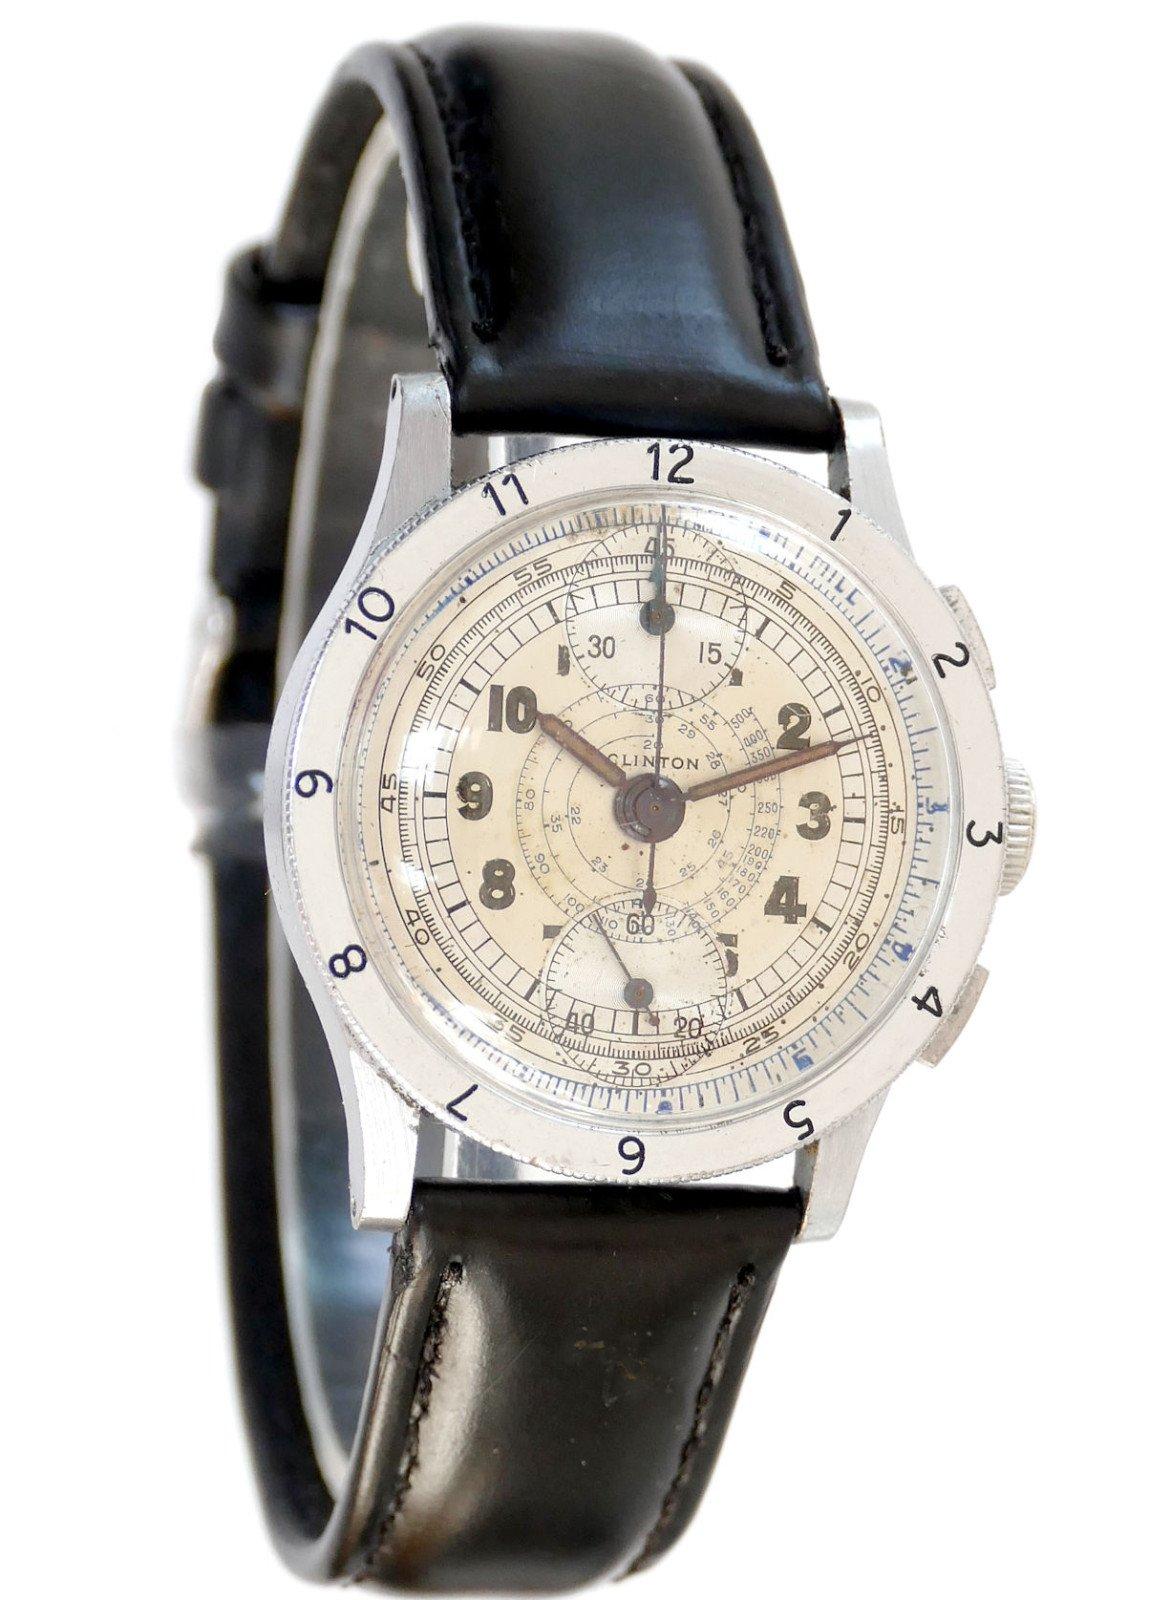 Clinton Vintage Chronograph Watch